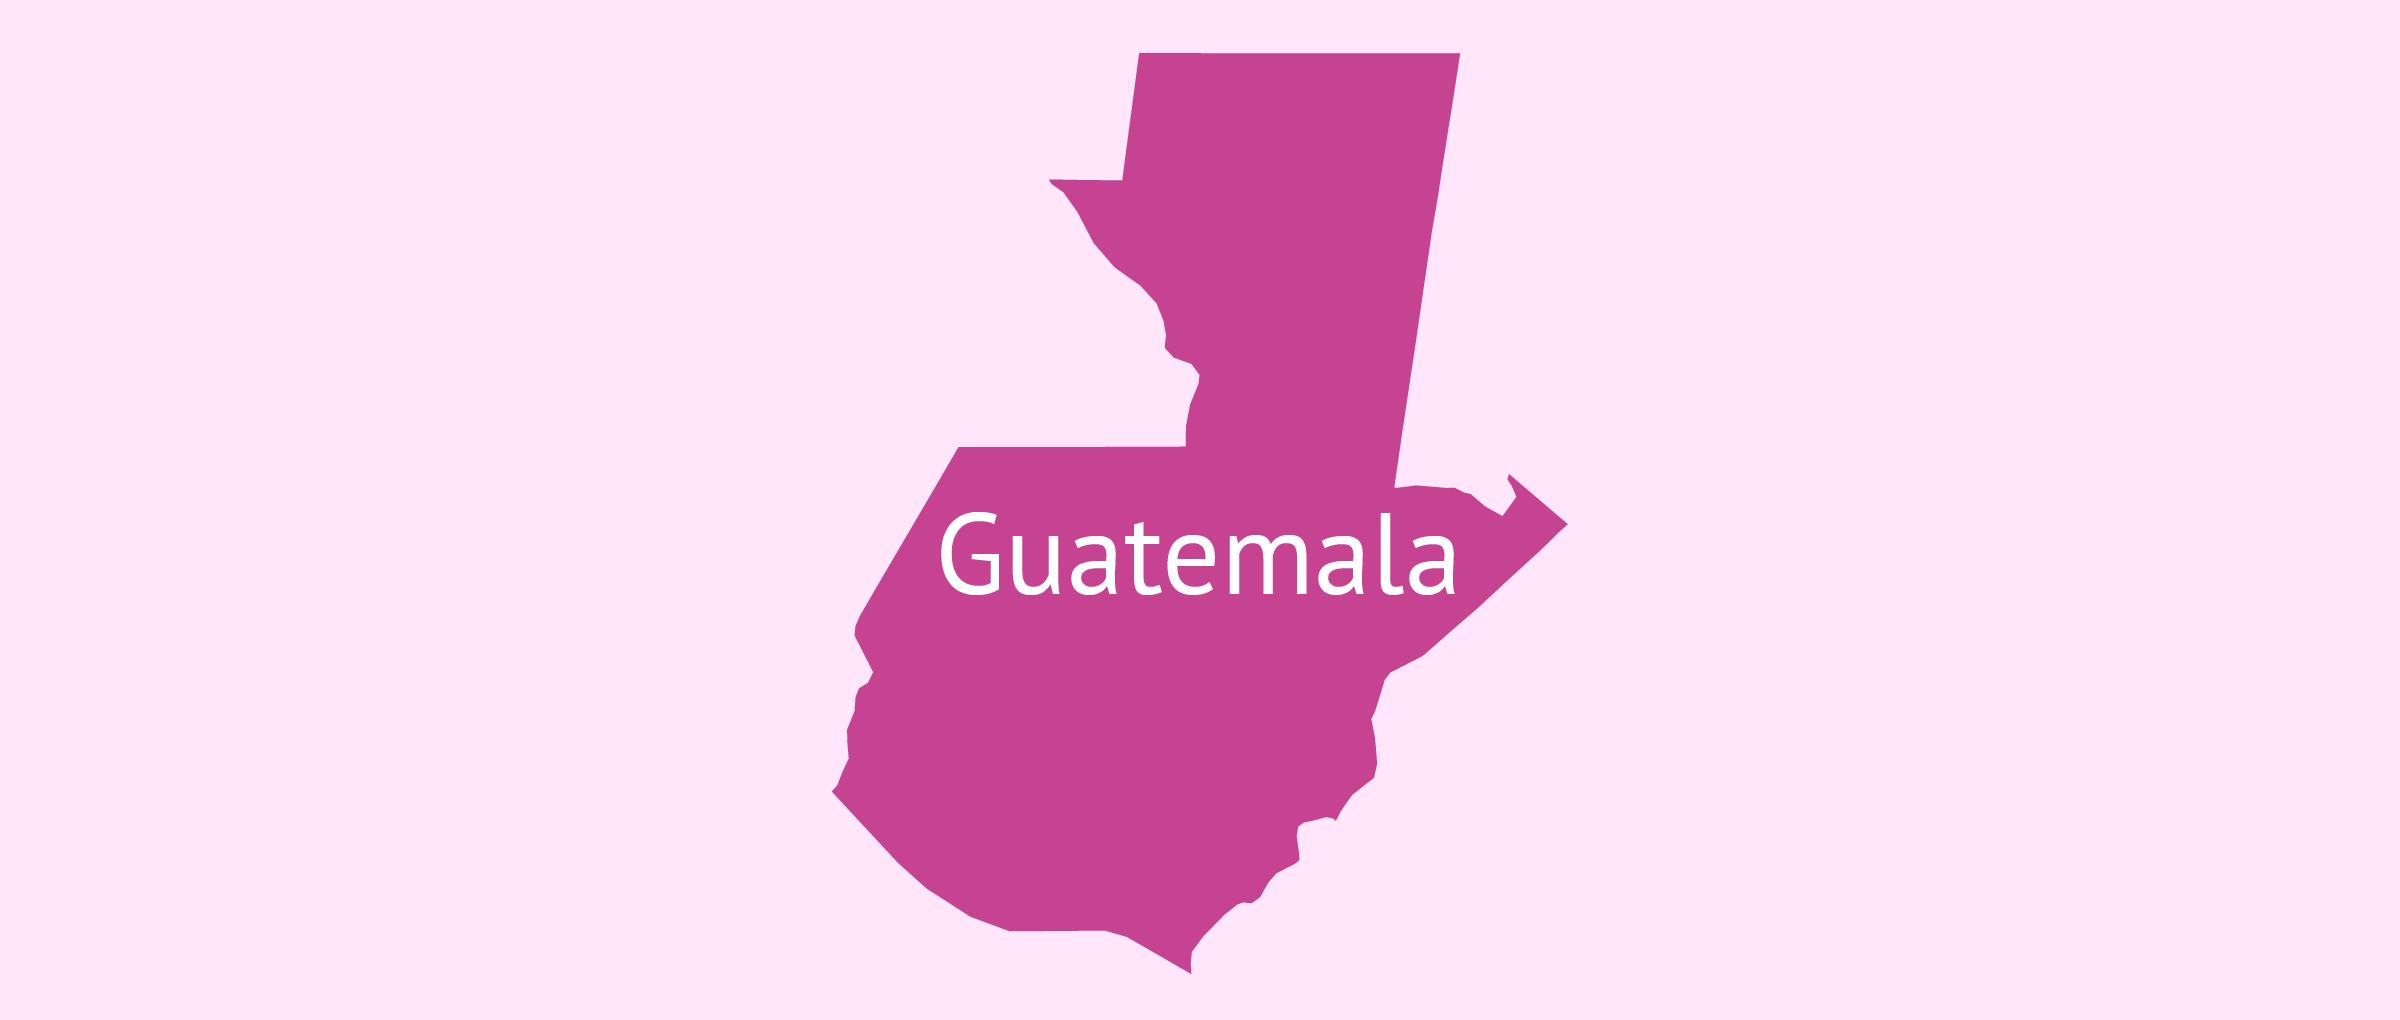 Guatemala Surrogacy